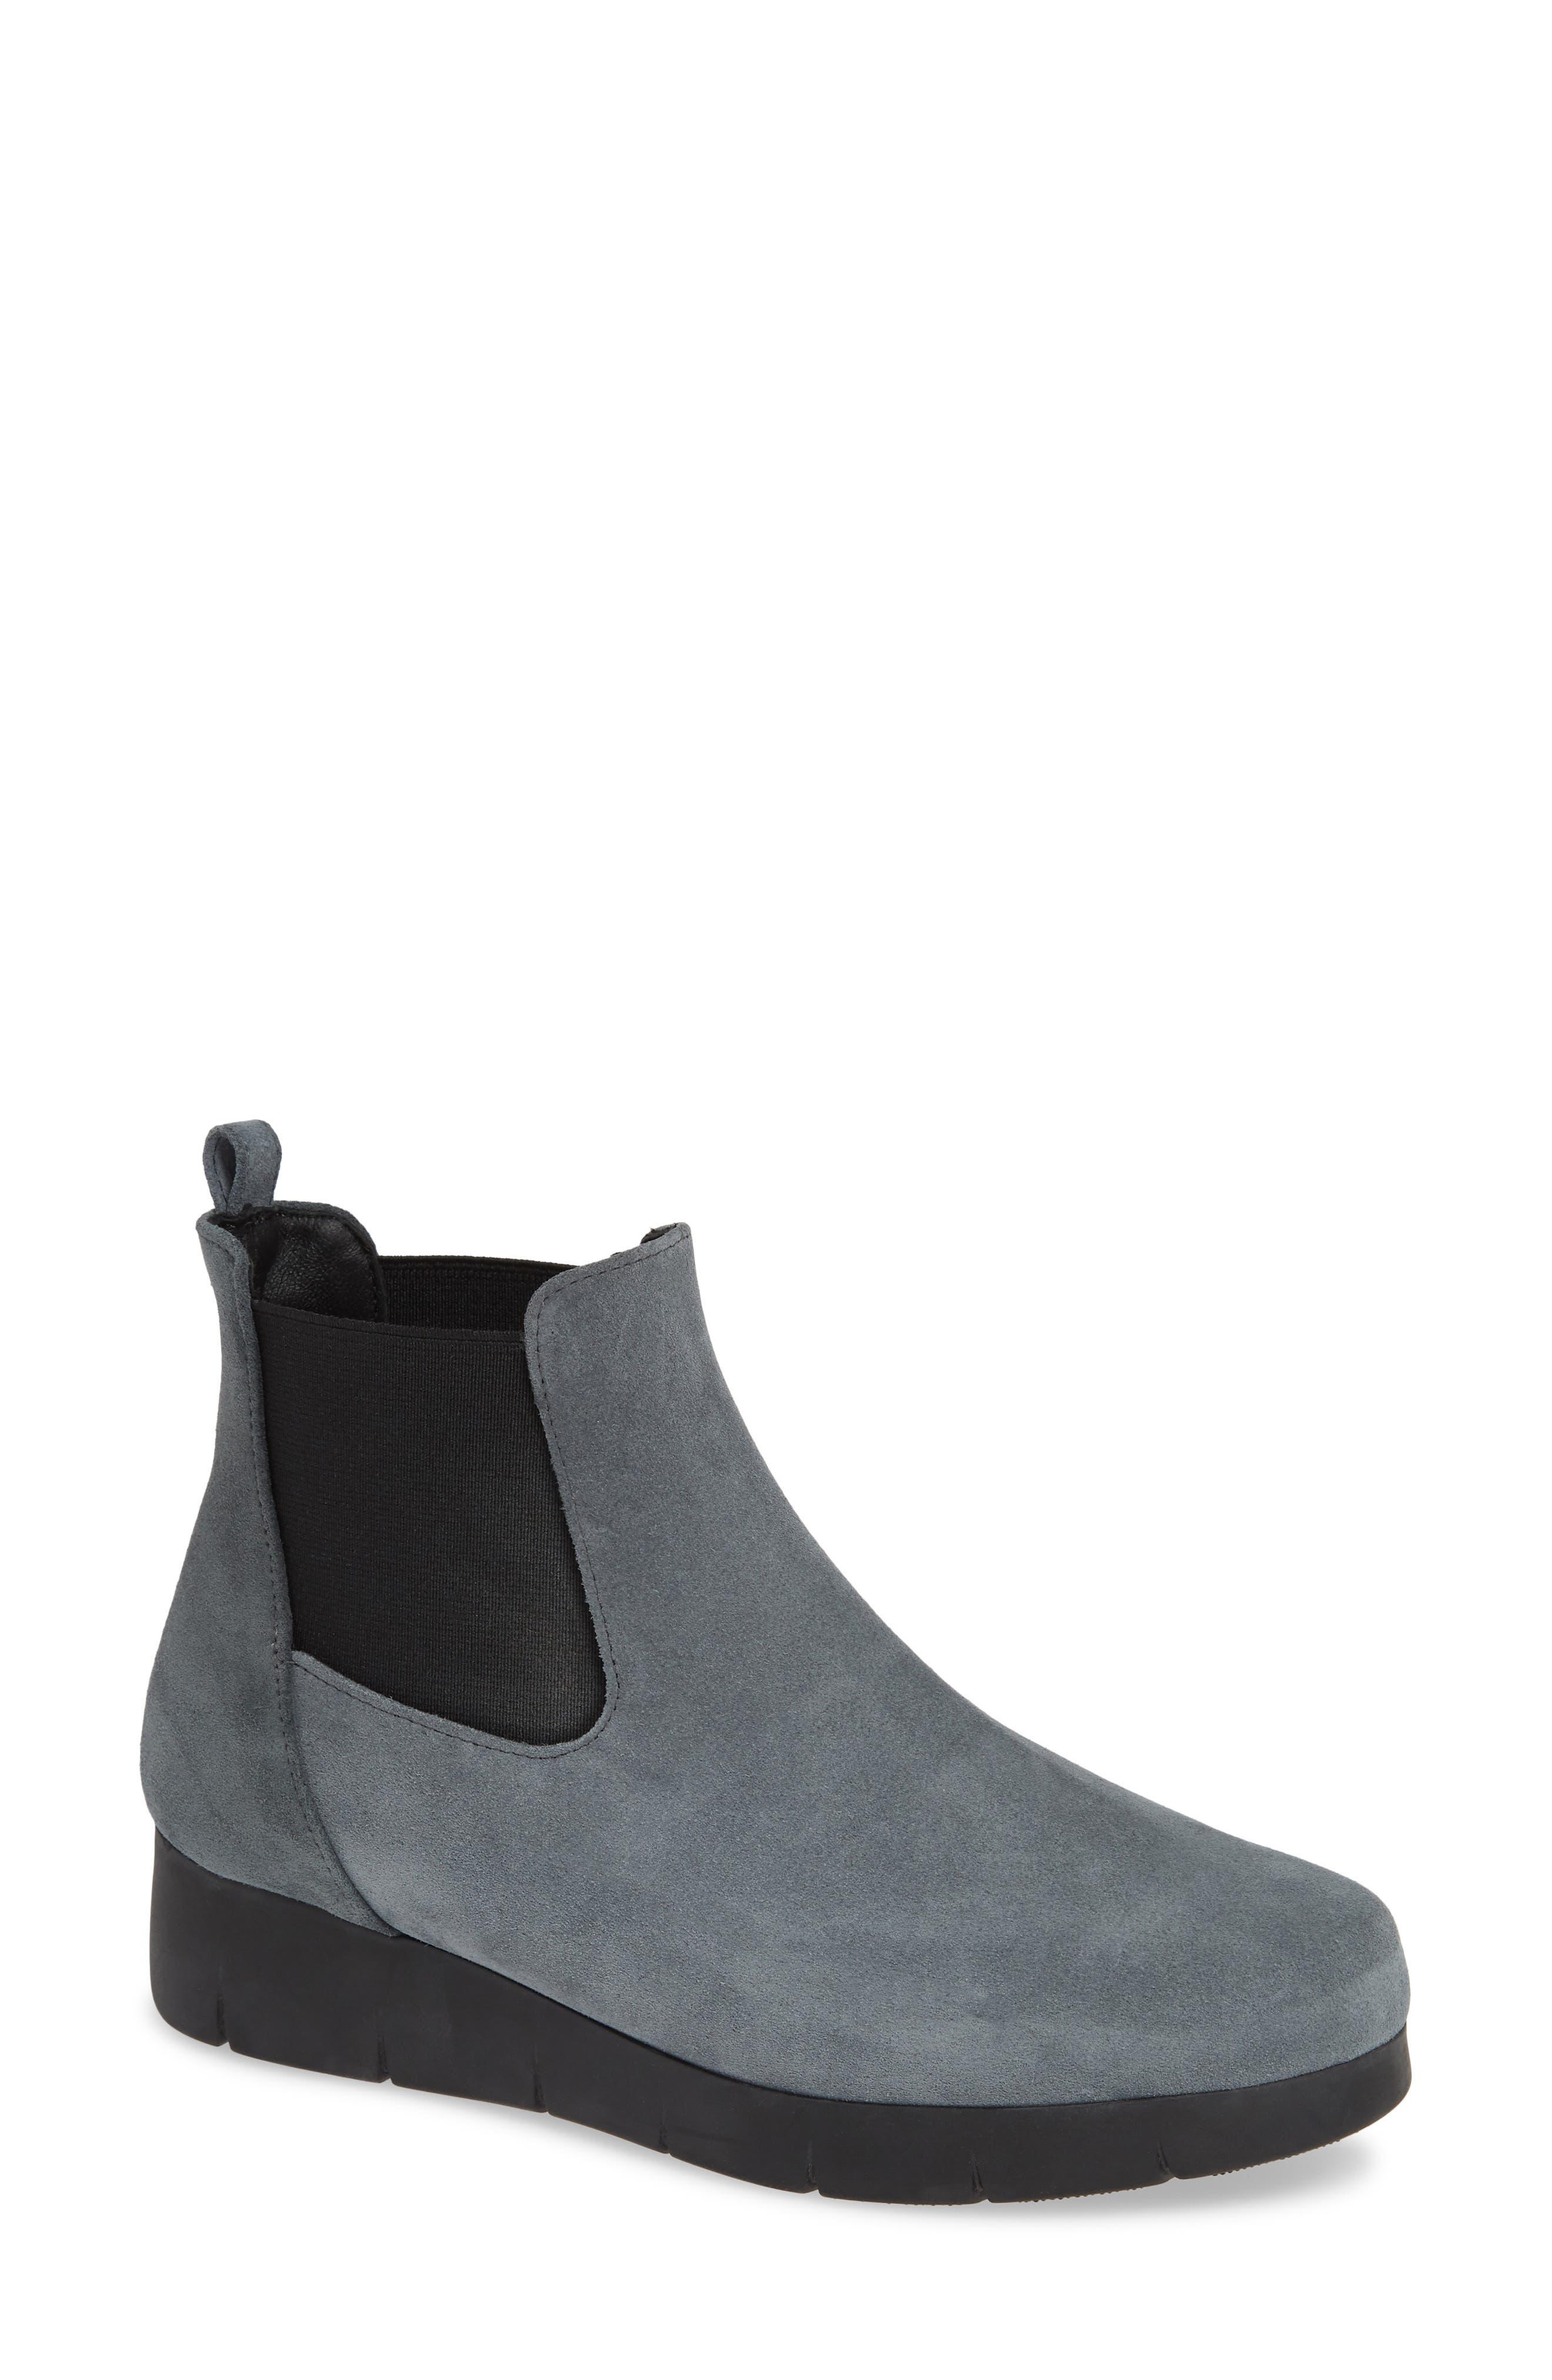 Cordani Aimee Water Resistant Chelsea Bootie, Grey